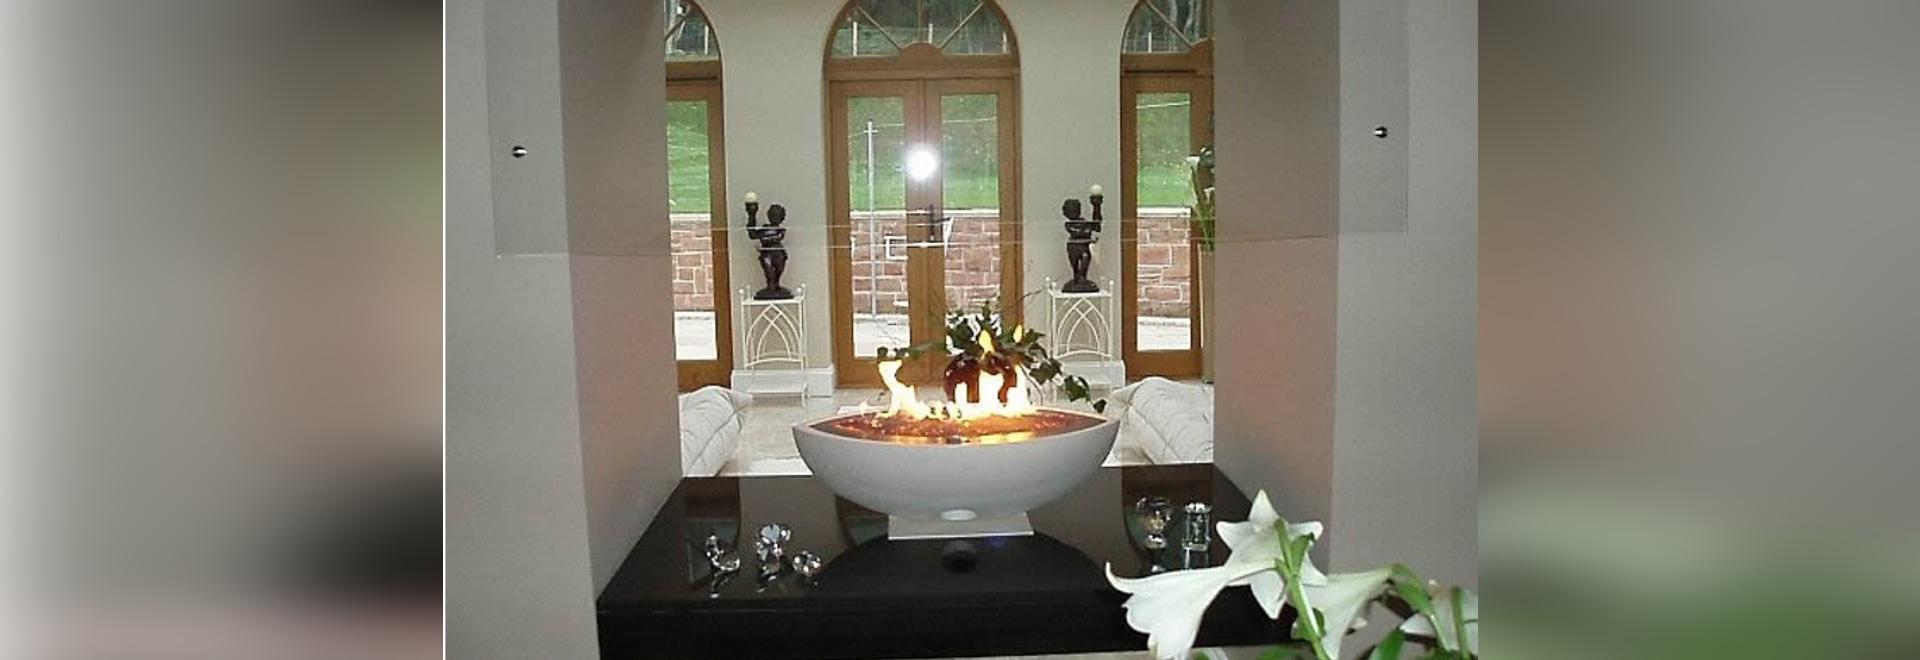 Privater Wohnsitz großes ovales weißes Gas Firebowl